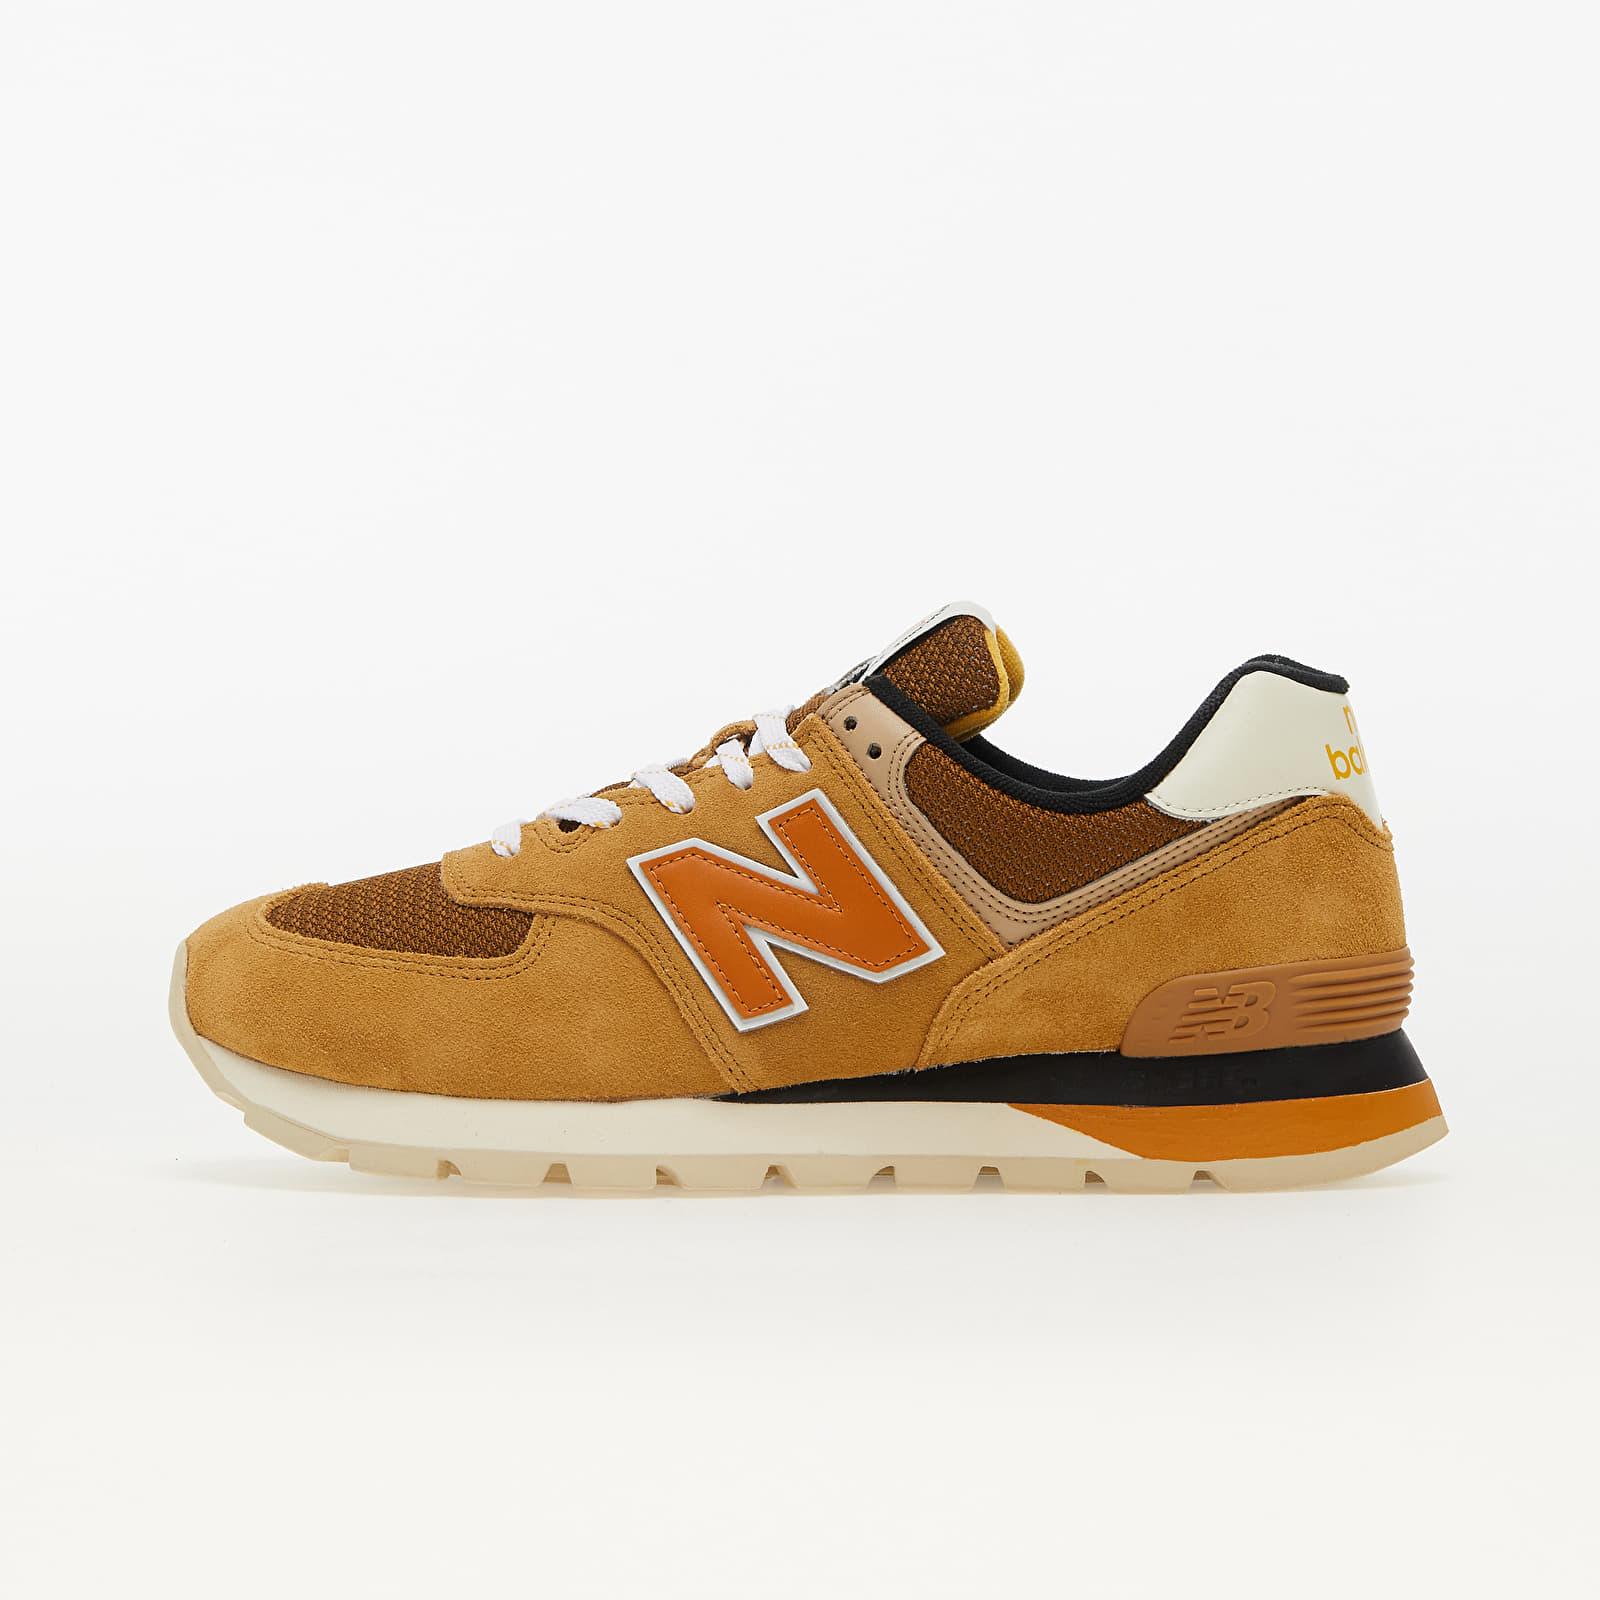 New Balance 574 Light Brown EUR 44